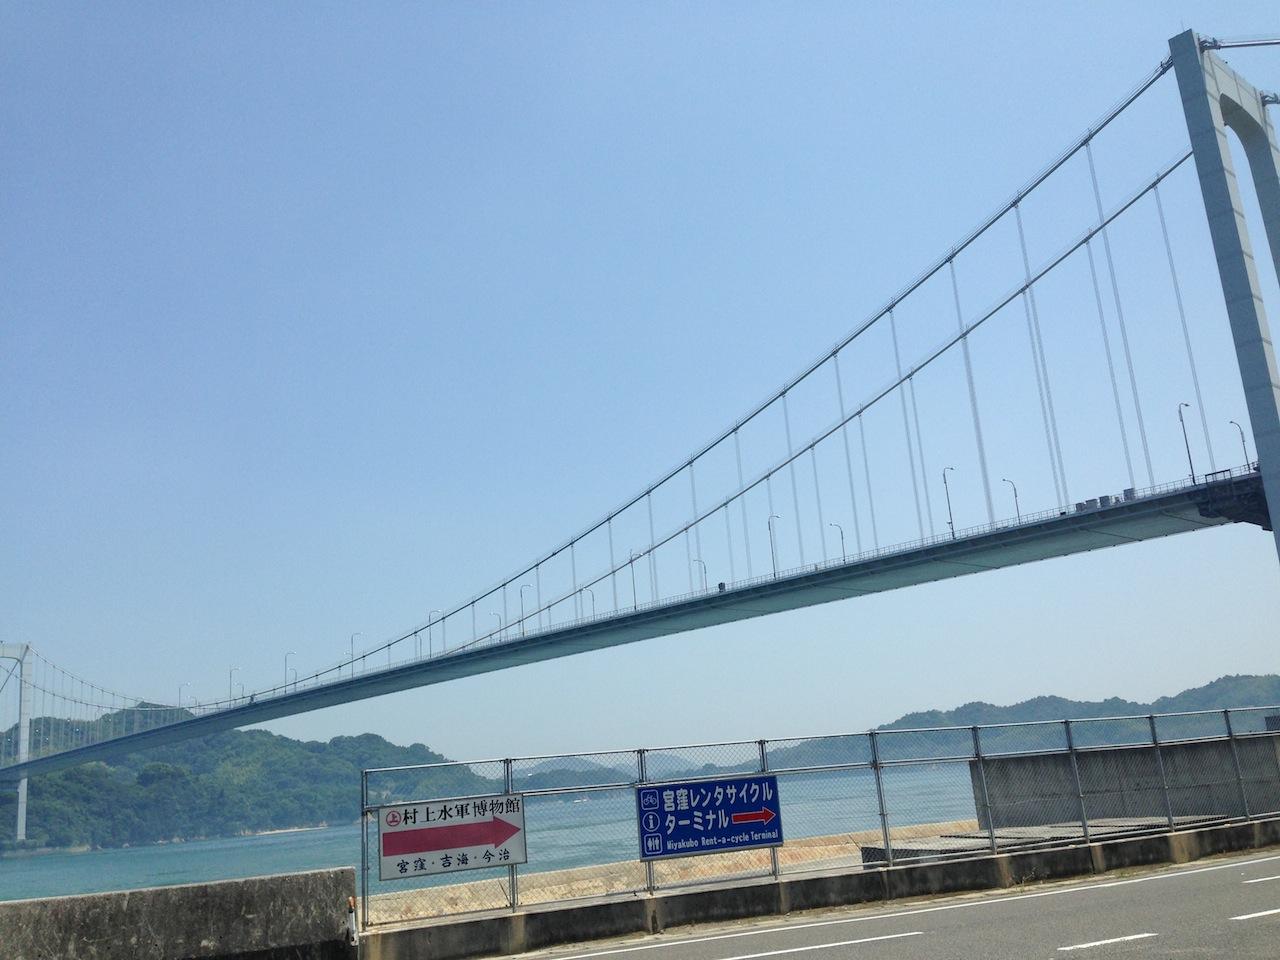 hakataooshima03